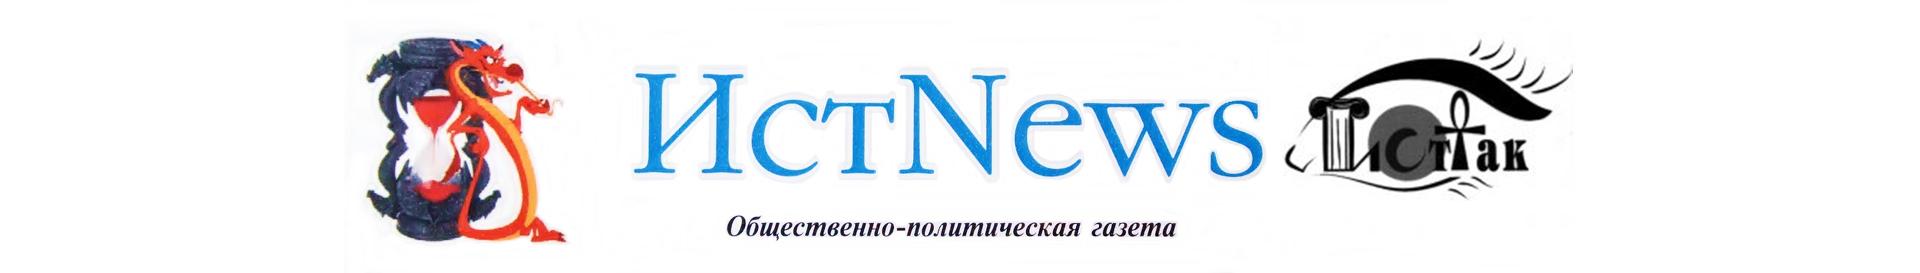 istnews2